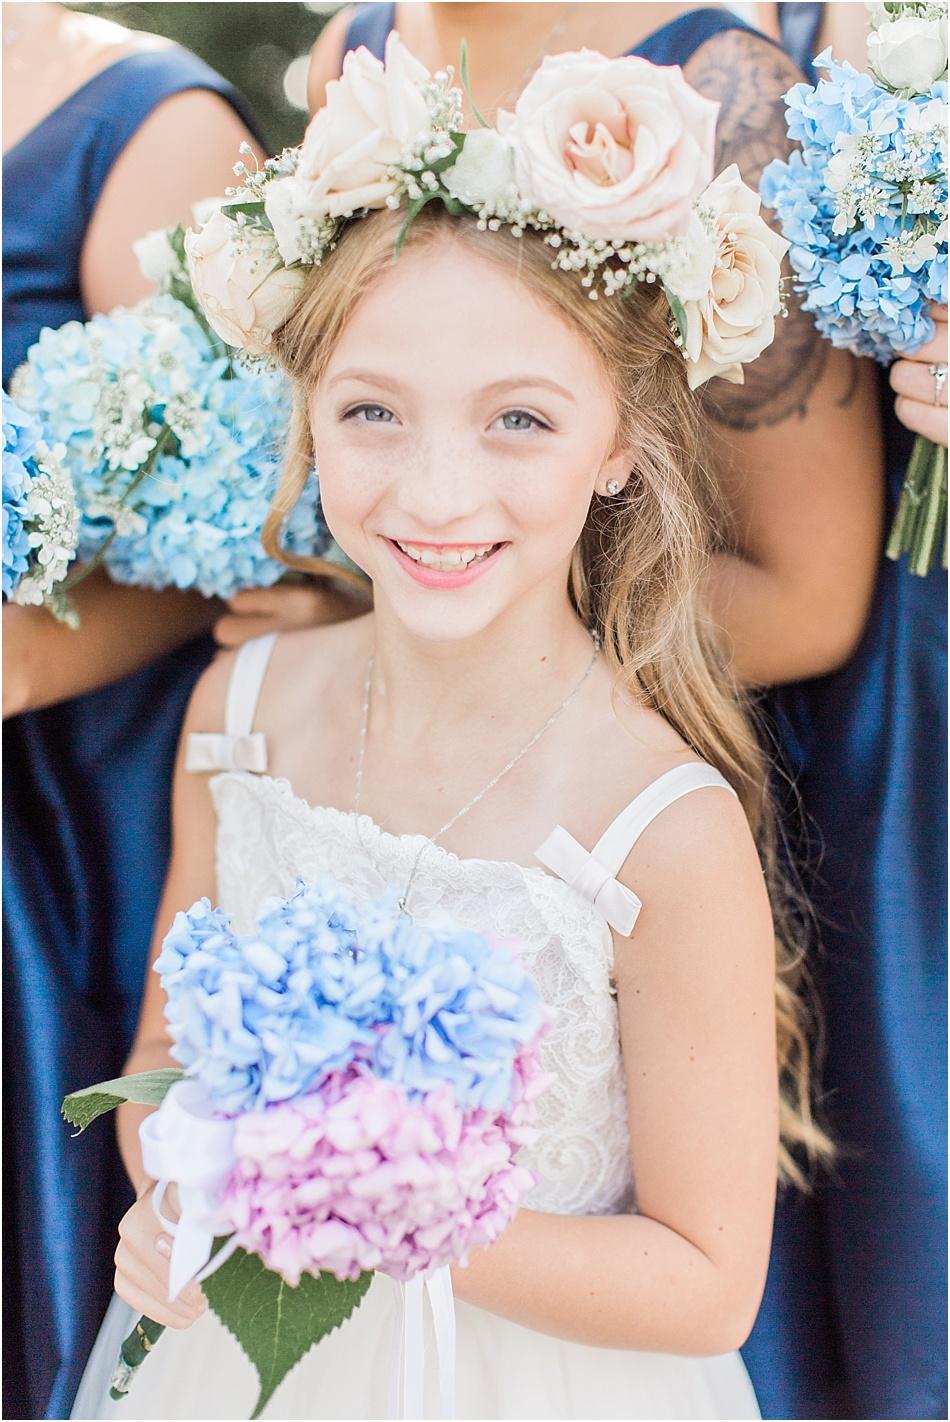 brookside_country_club_cape_cod_boston_wedding_photographer_Meredith_Jane_Photography_photo_0143.jpg